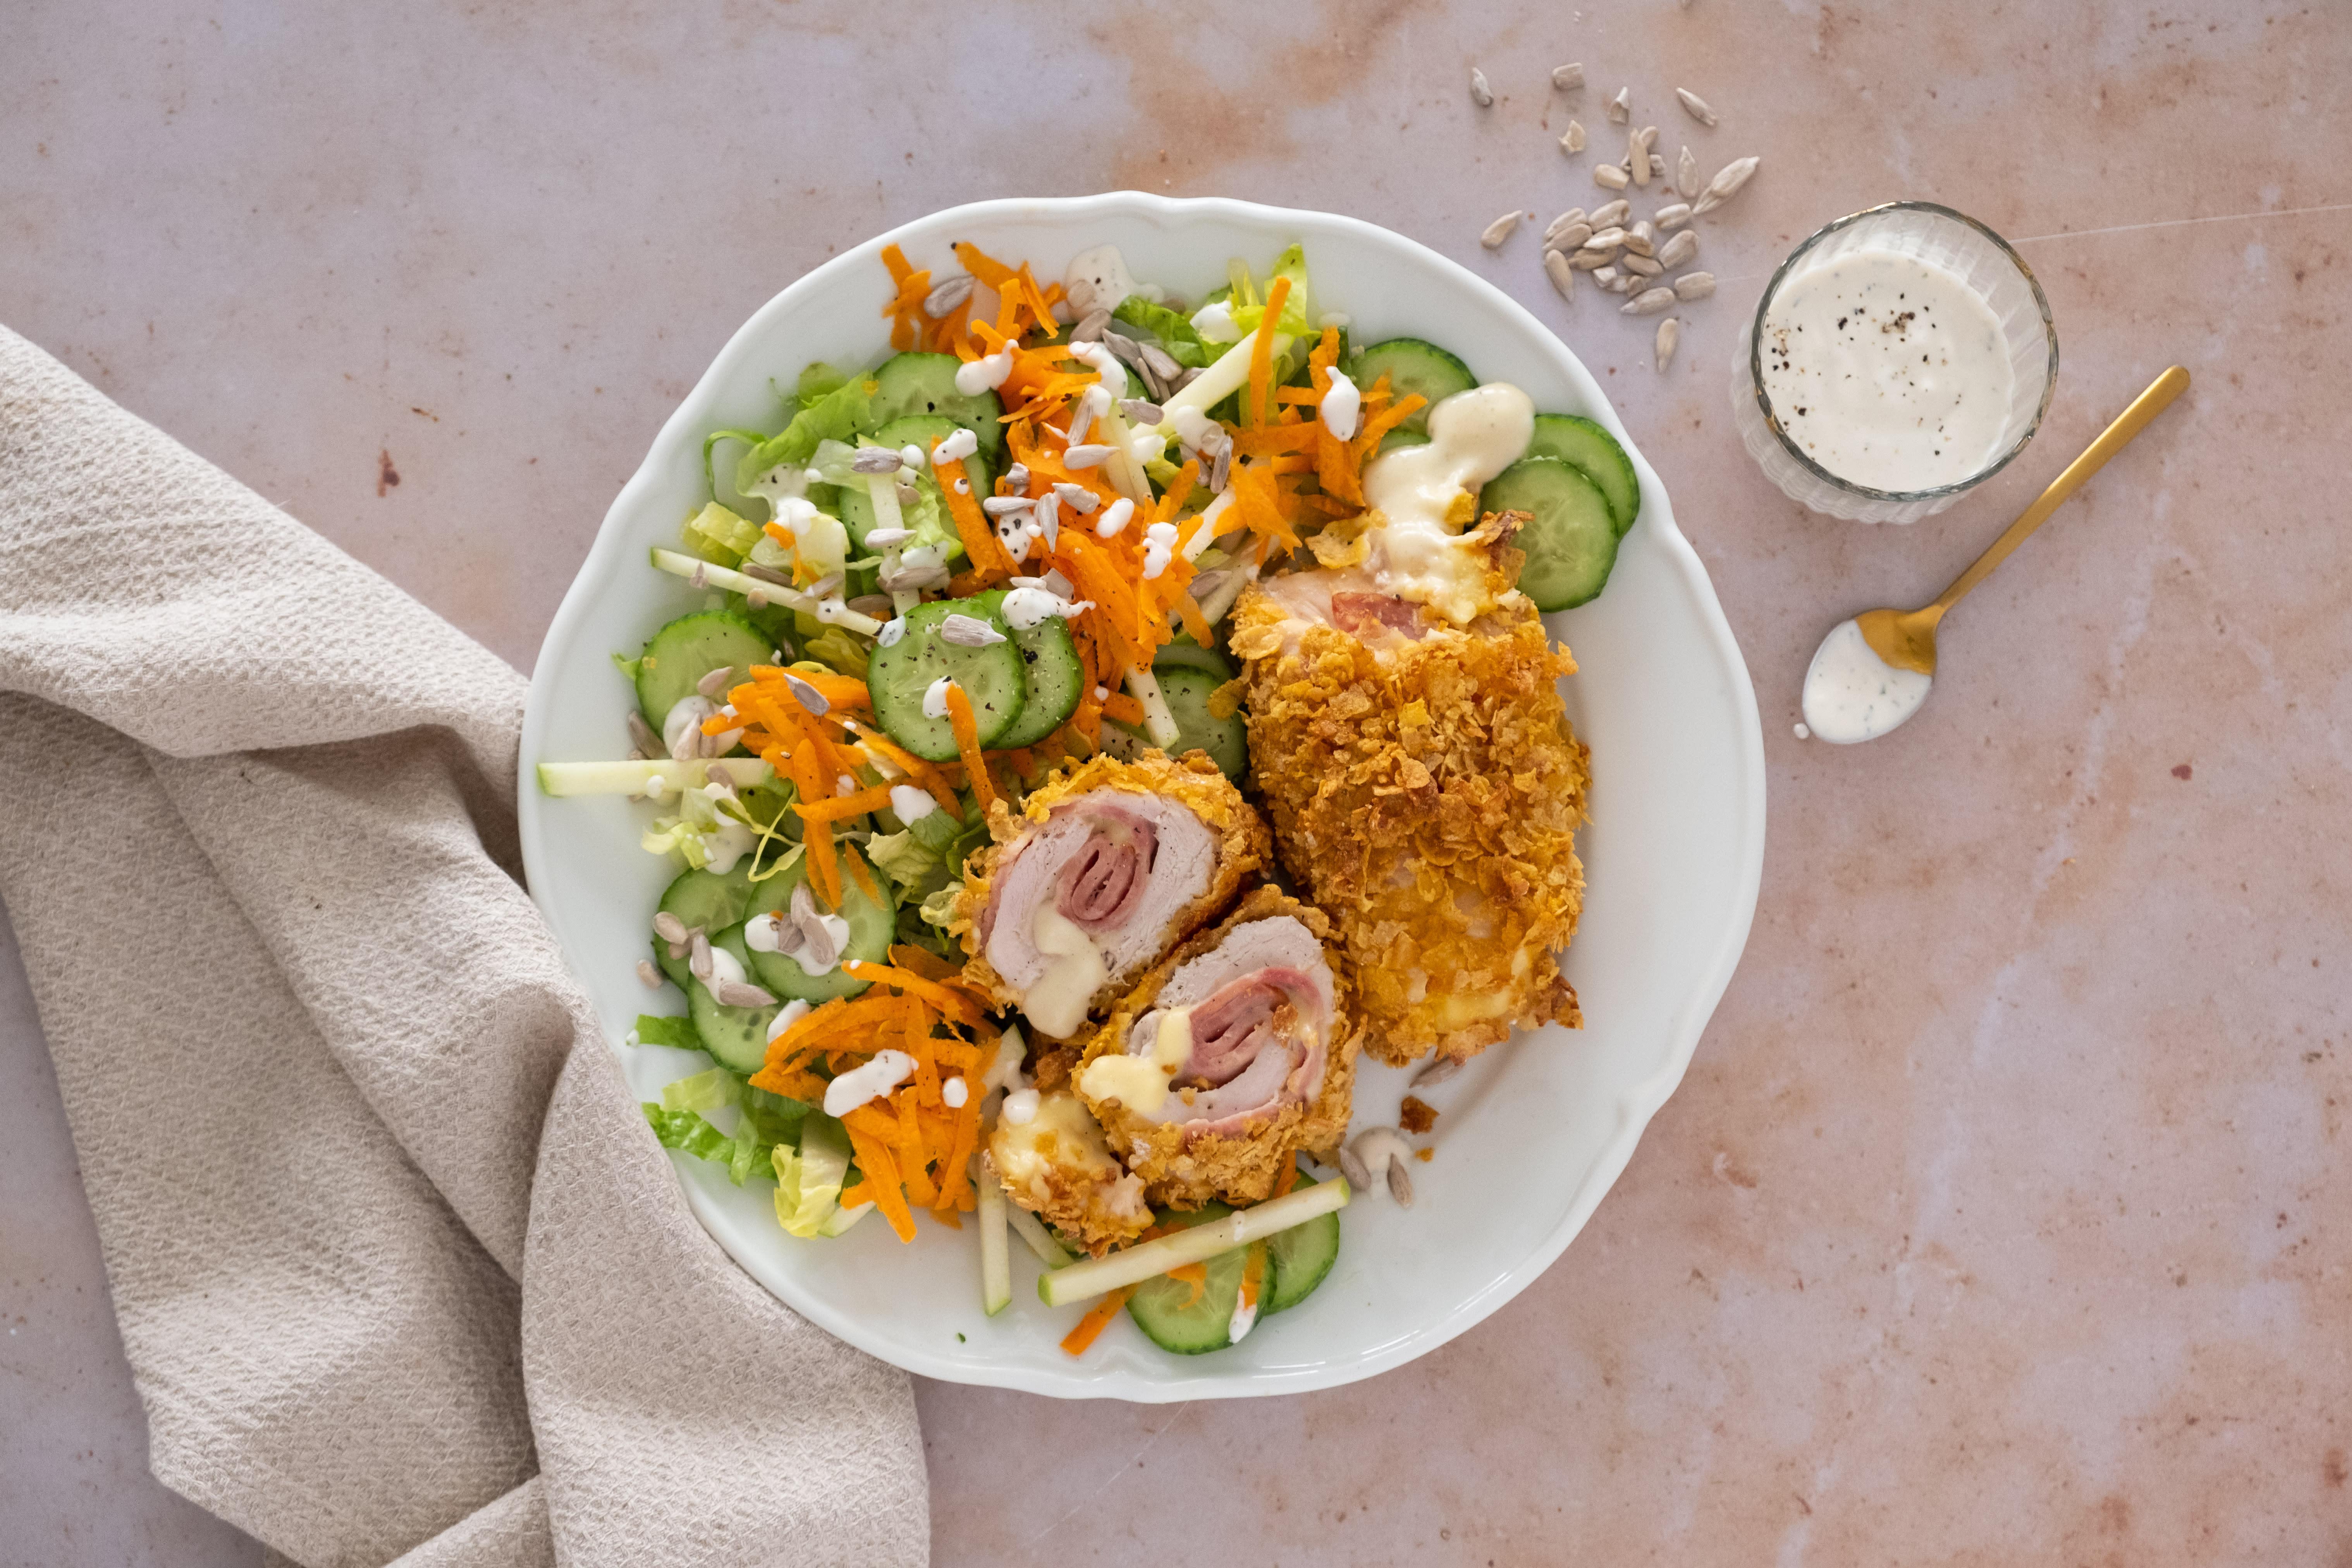 Retro Cordon Bleu with Crunchy French Salad